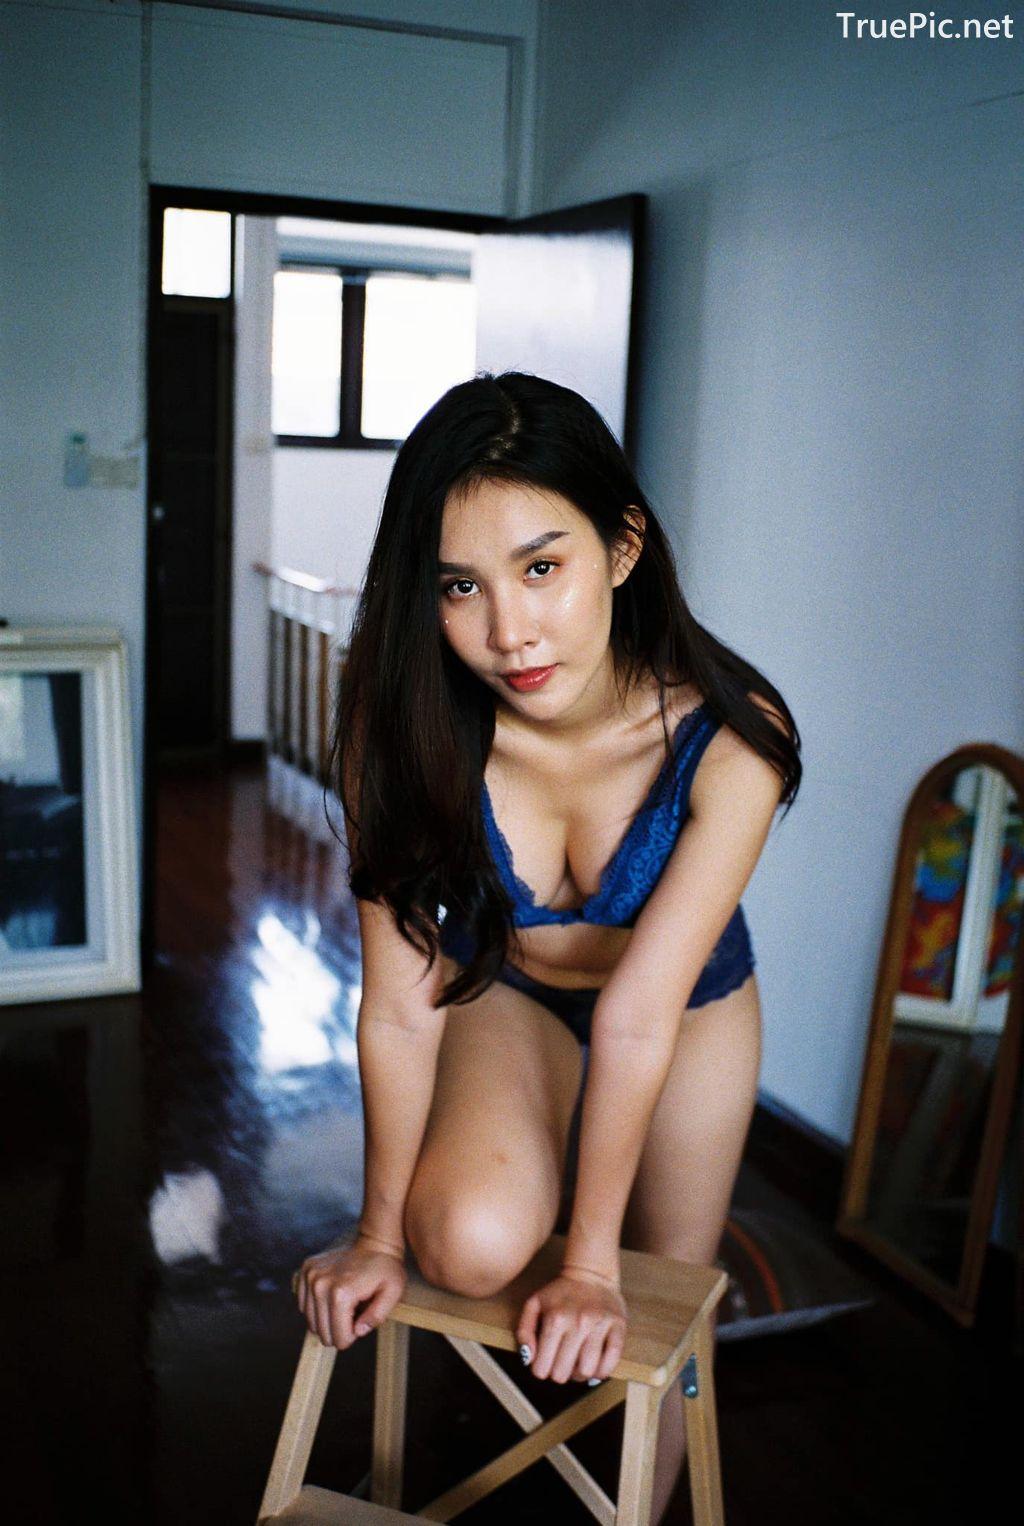 Image-Thailand-Model-Ssomch-Tanass-Blue-Lingerie-TruePic.net-TruePic.net- Picture-16